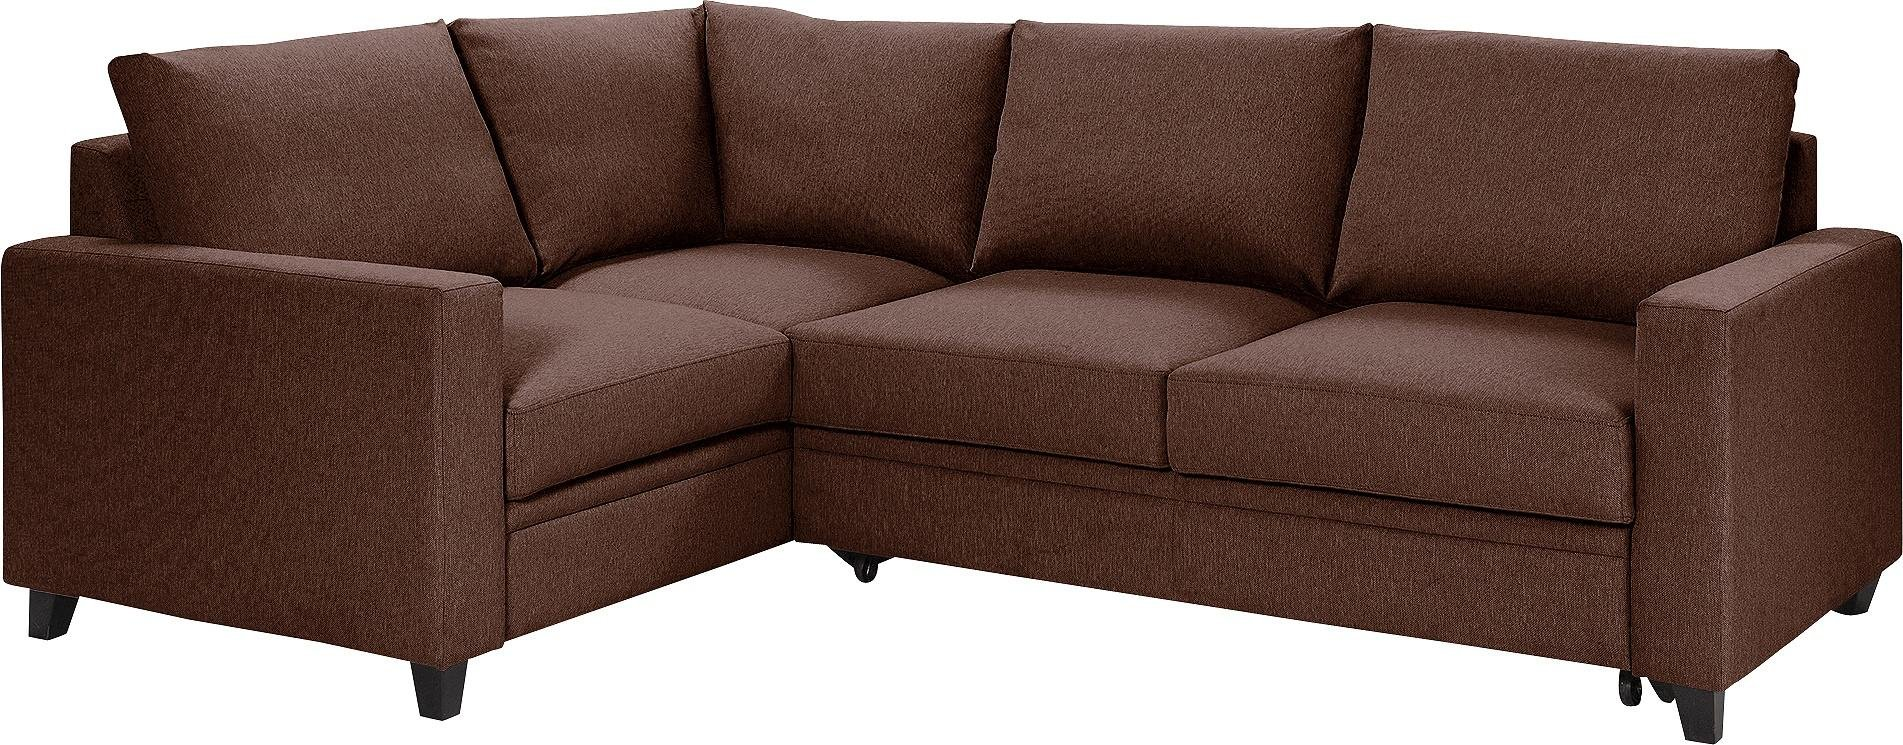 Argos Home Seattle Left Corner Fabric Sofa Bed - Brown